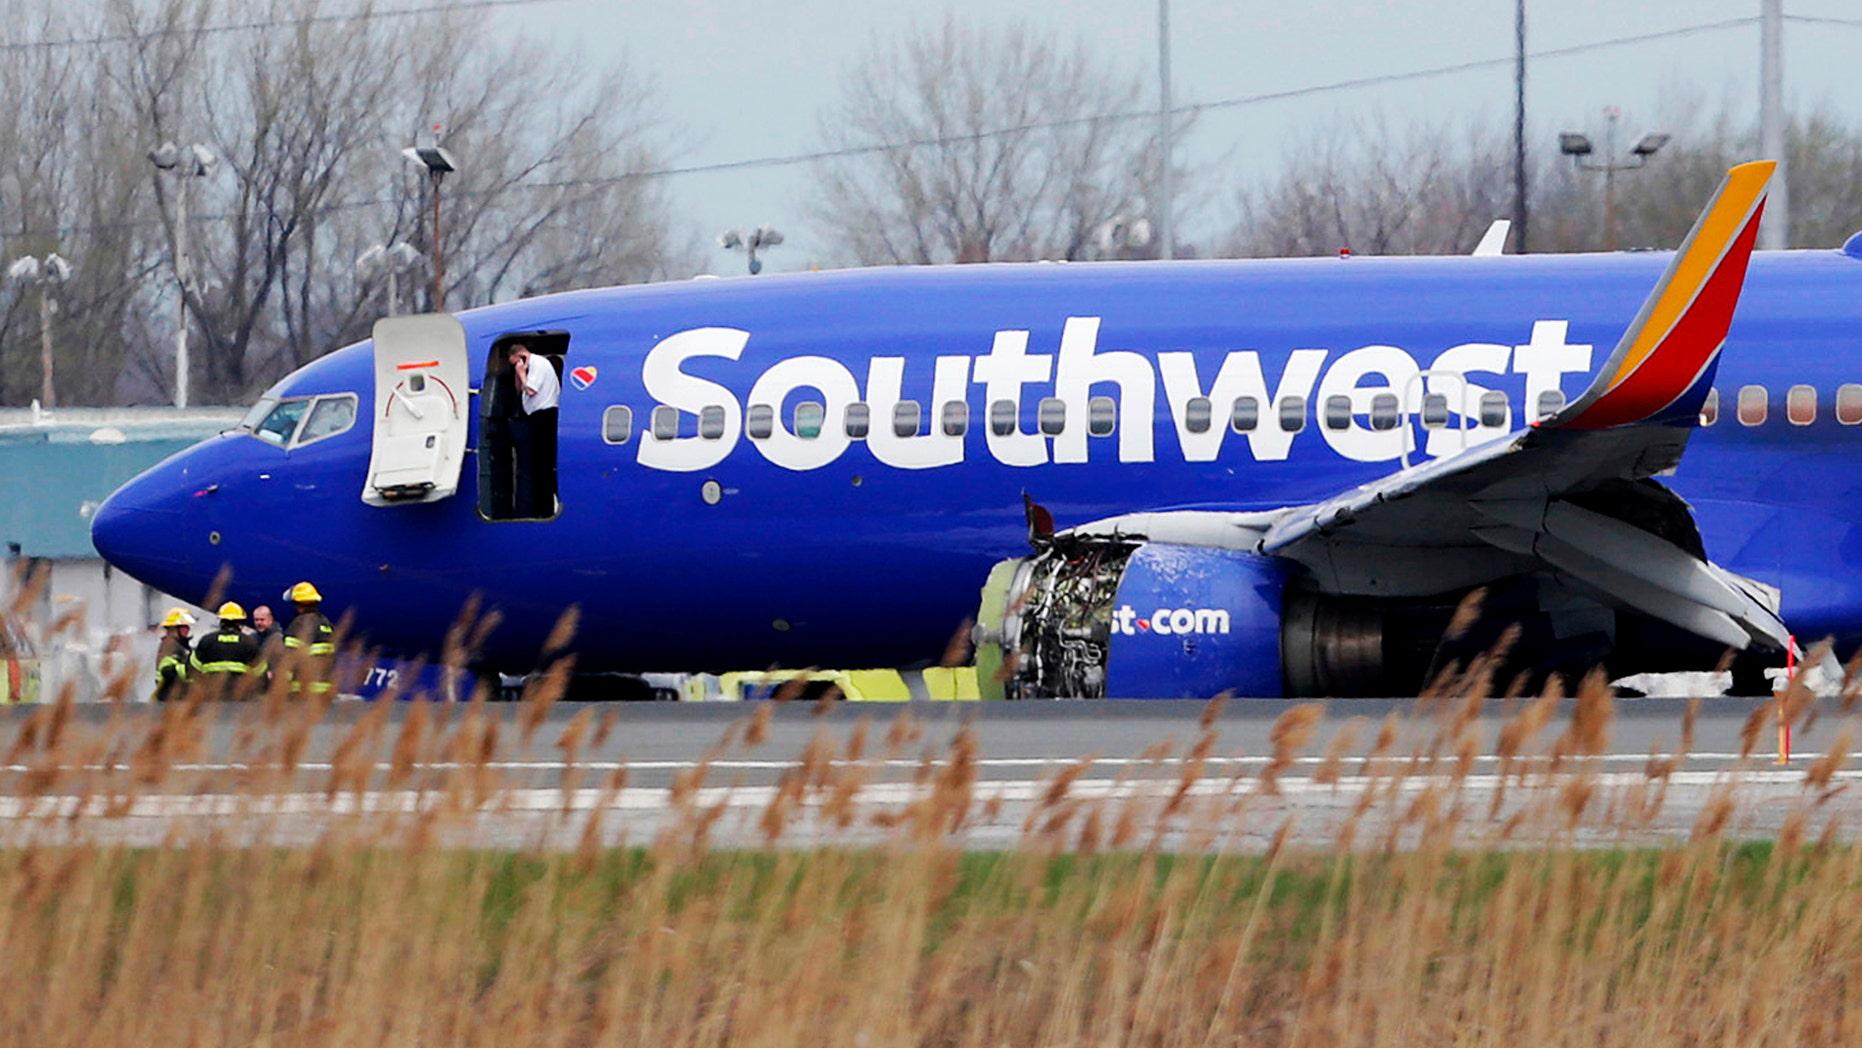 hearing reveals chilling details of fatal southwest flight | fox news